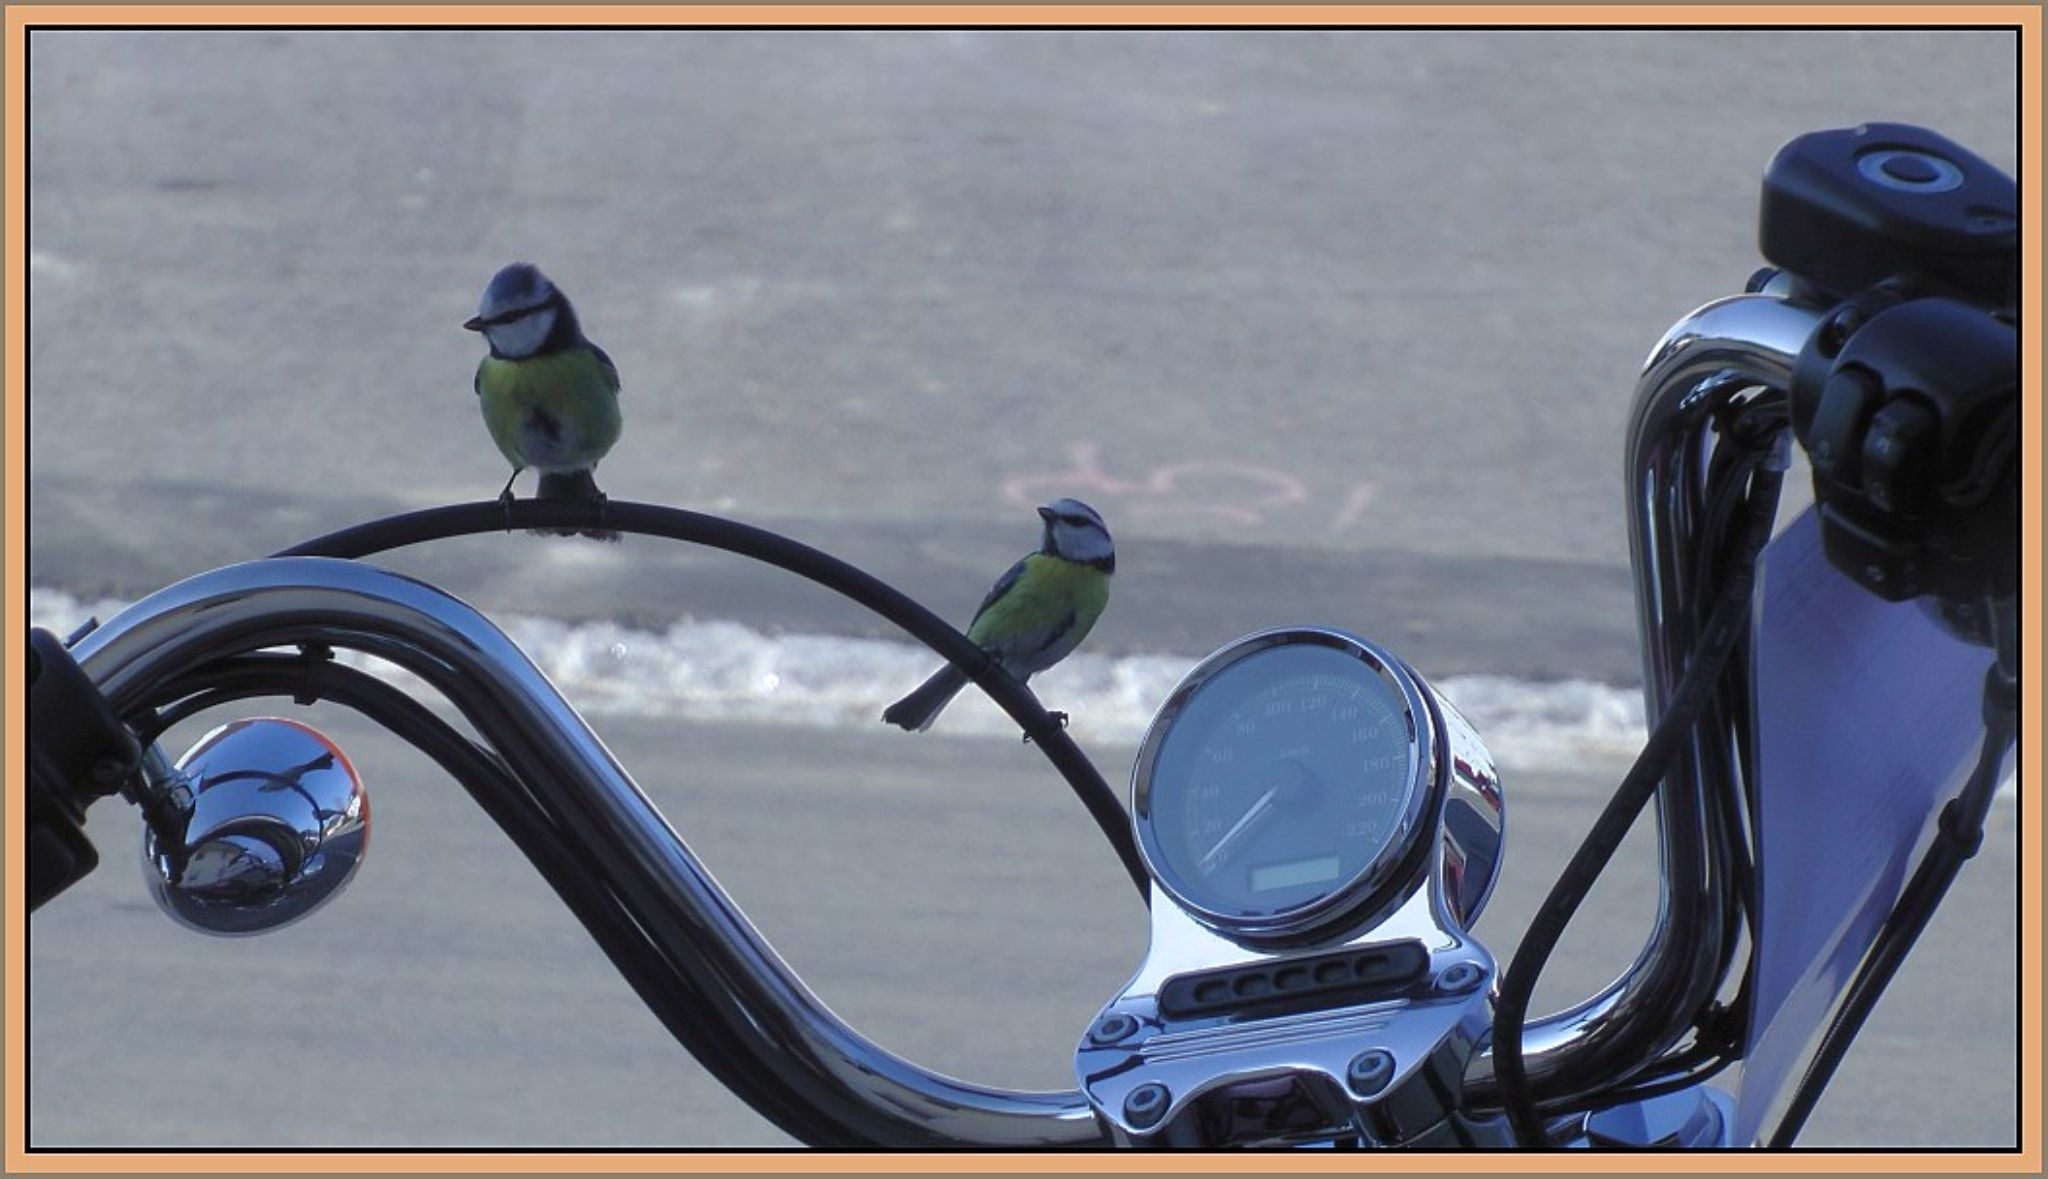 Vögel auf der Harley by maha